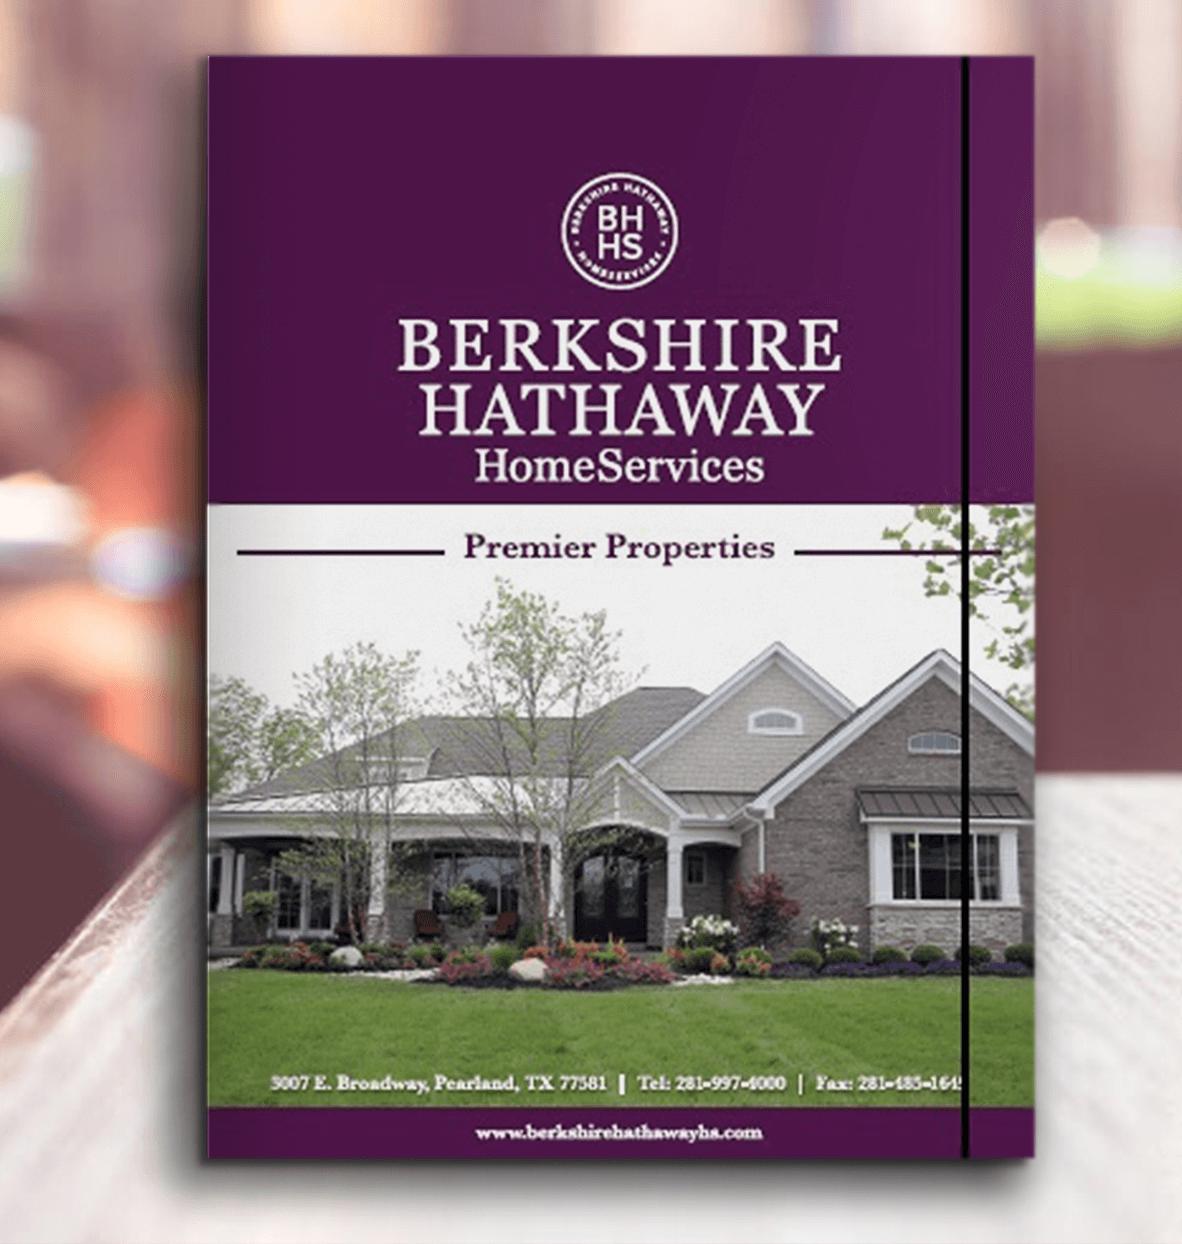 BHHS Portfolio